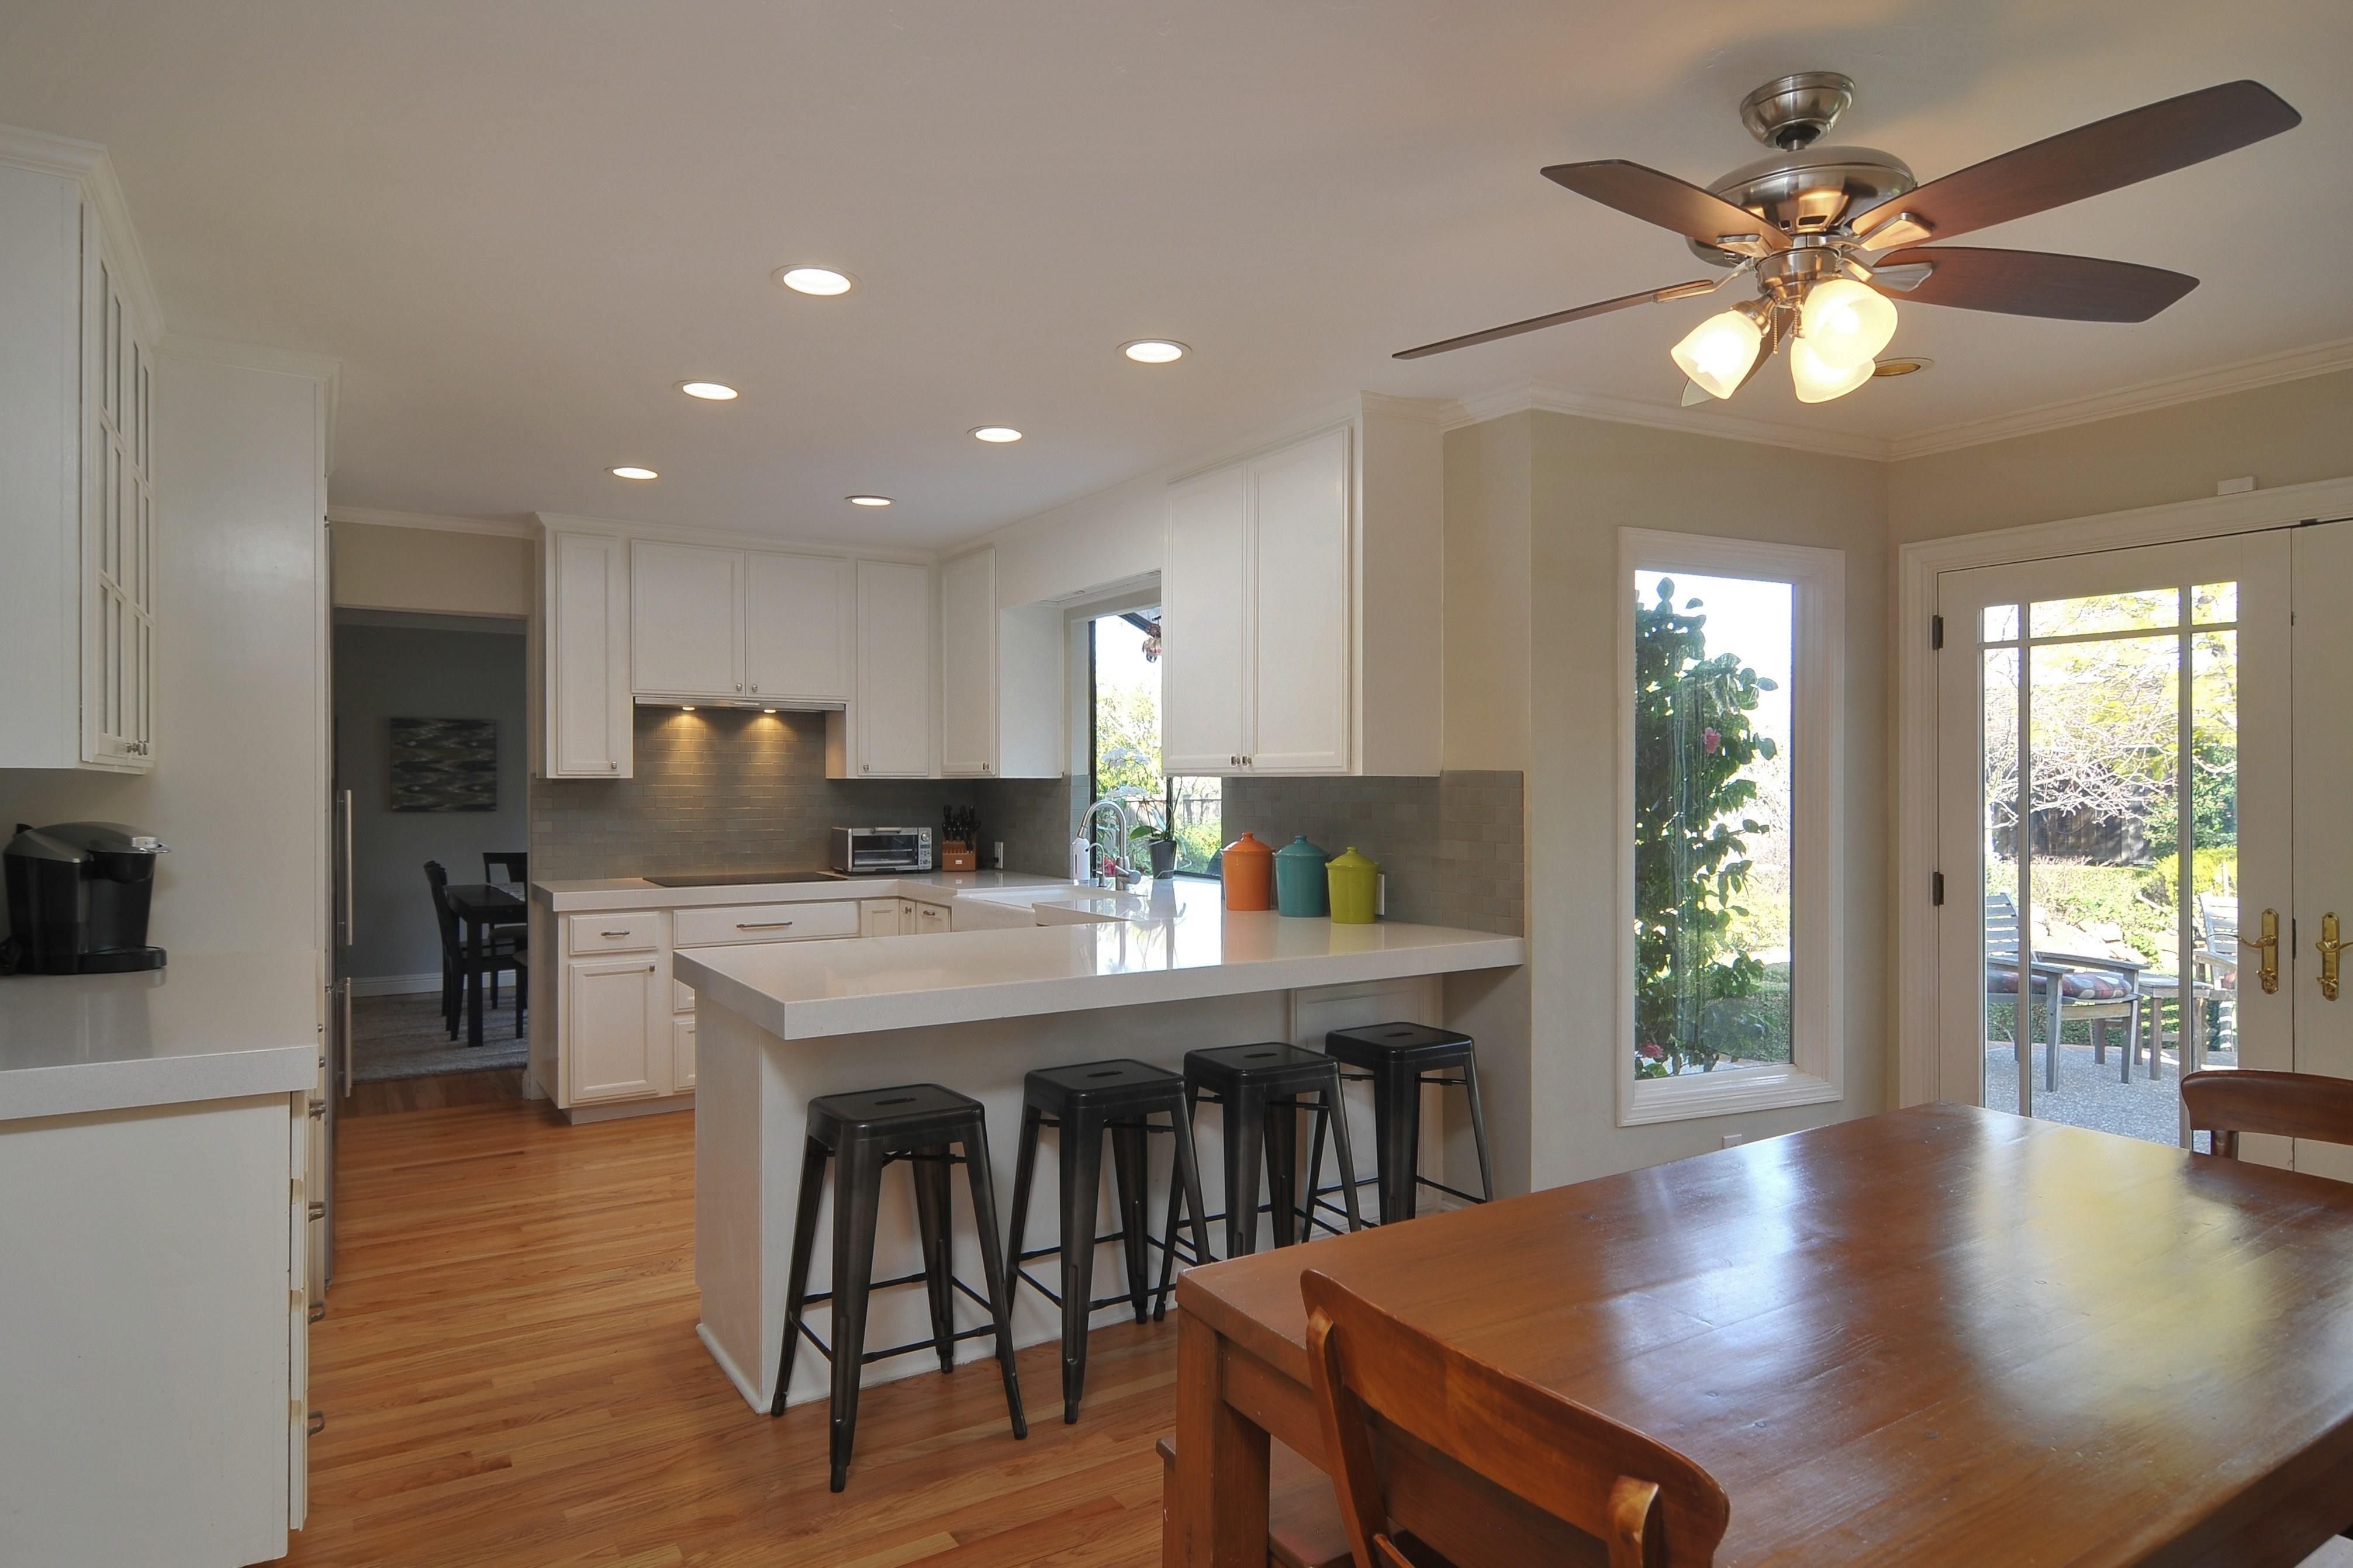 008 Kitchen 3 - Exquisite, expansive, remodeled Belwood home - 127 Belhaven Drive, Los Gatos